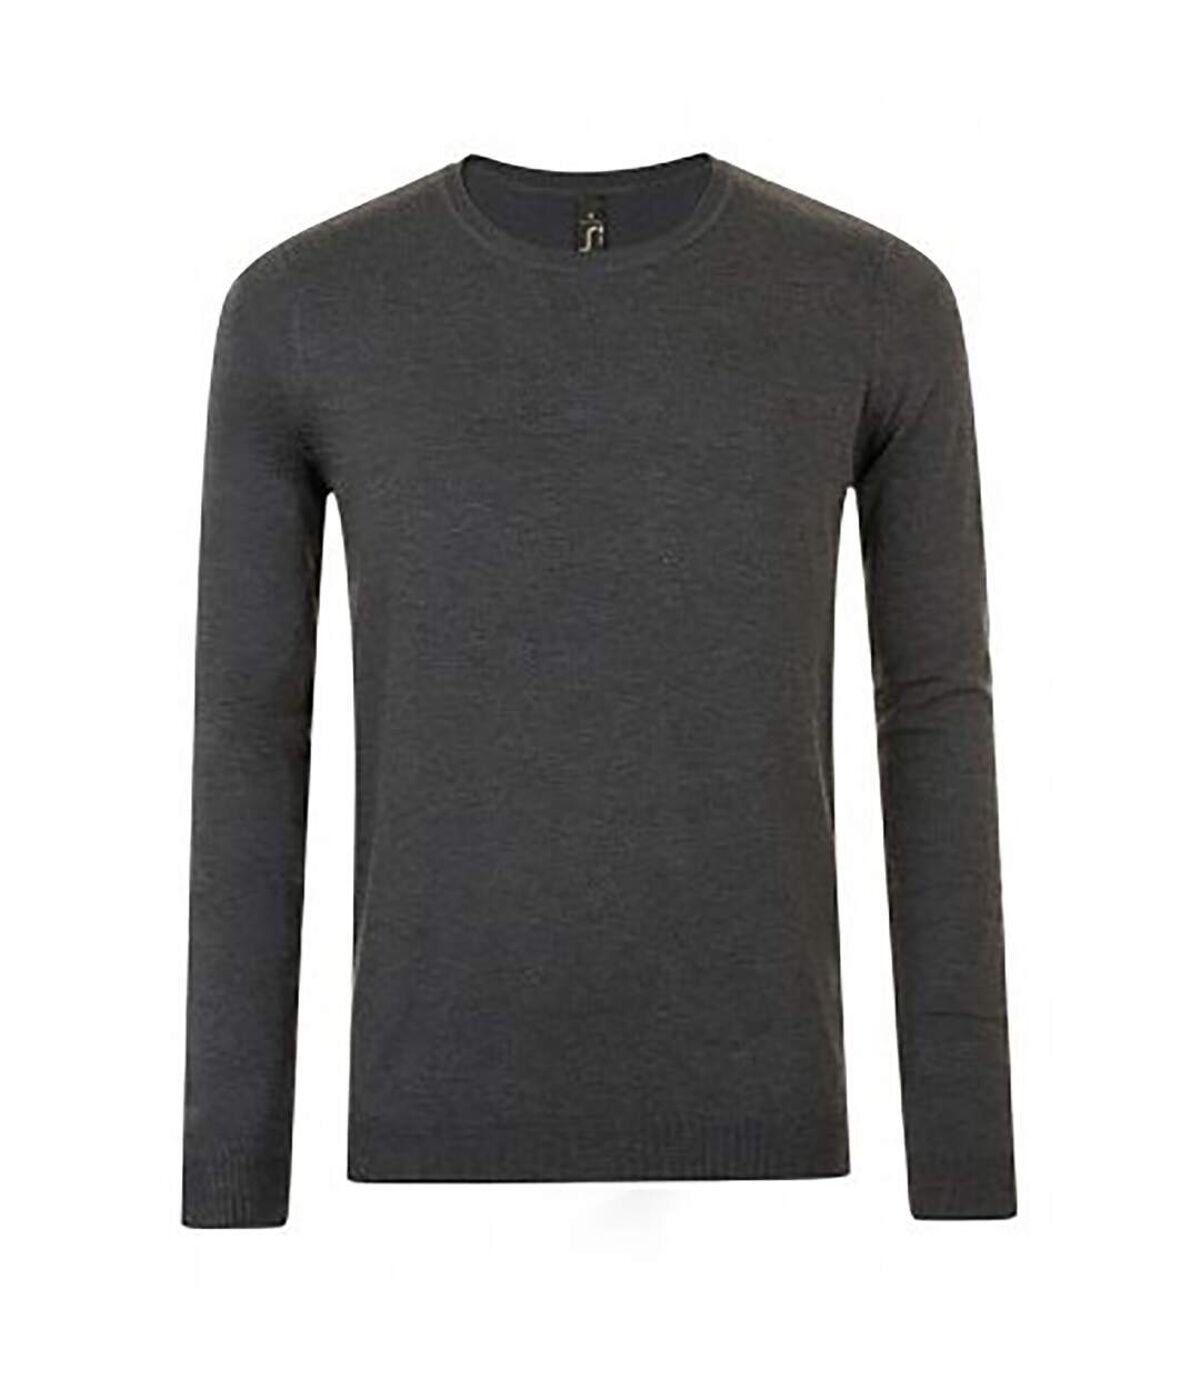 SOLS Ginger - Sweat-shirt à col ras-du-cou - Homme (Bleu marine) - UTPC2831